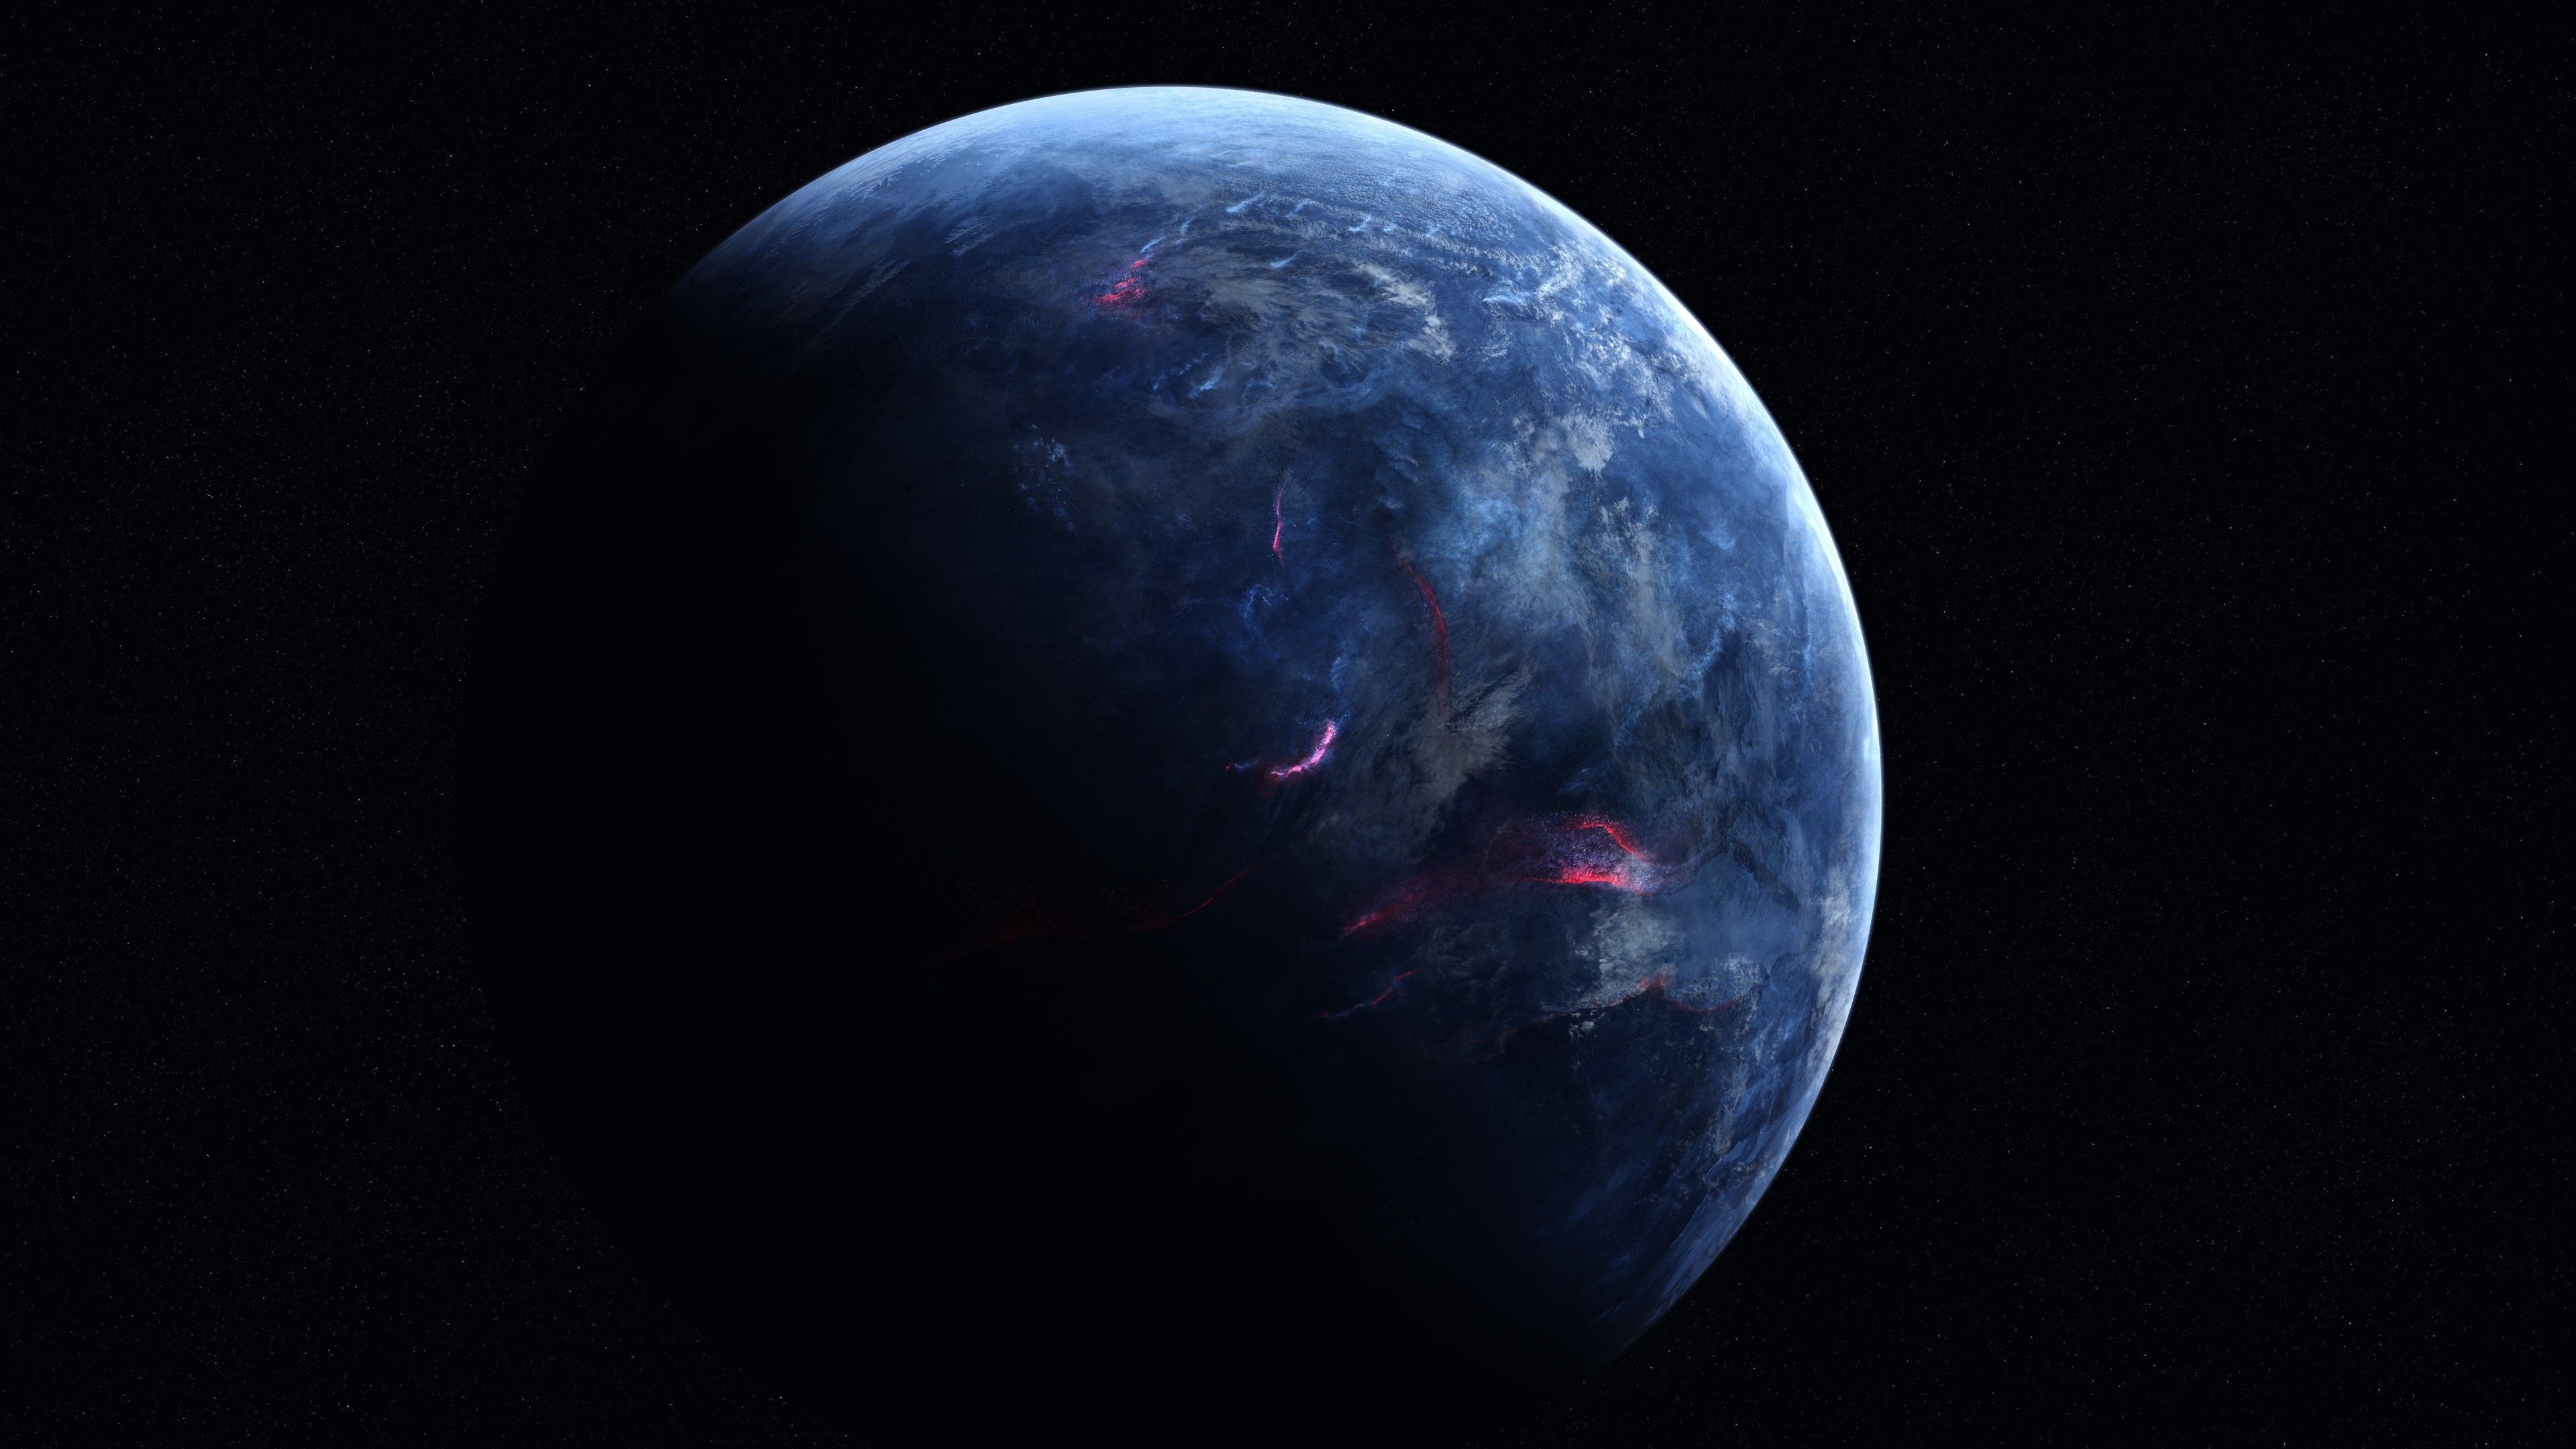 3840x2160 Blue Planet 4k Hd Wallpaper Computer Desktop Hd Wallpaper Planets Earth From Space